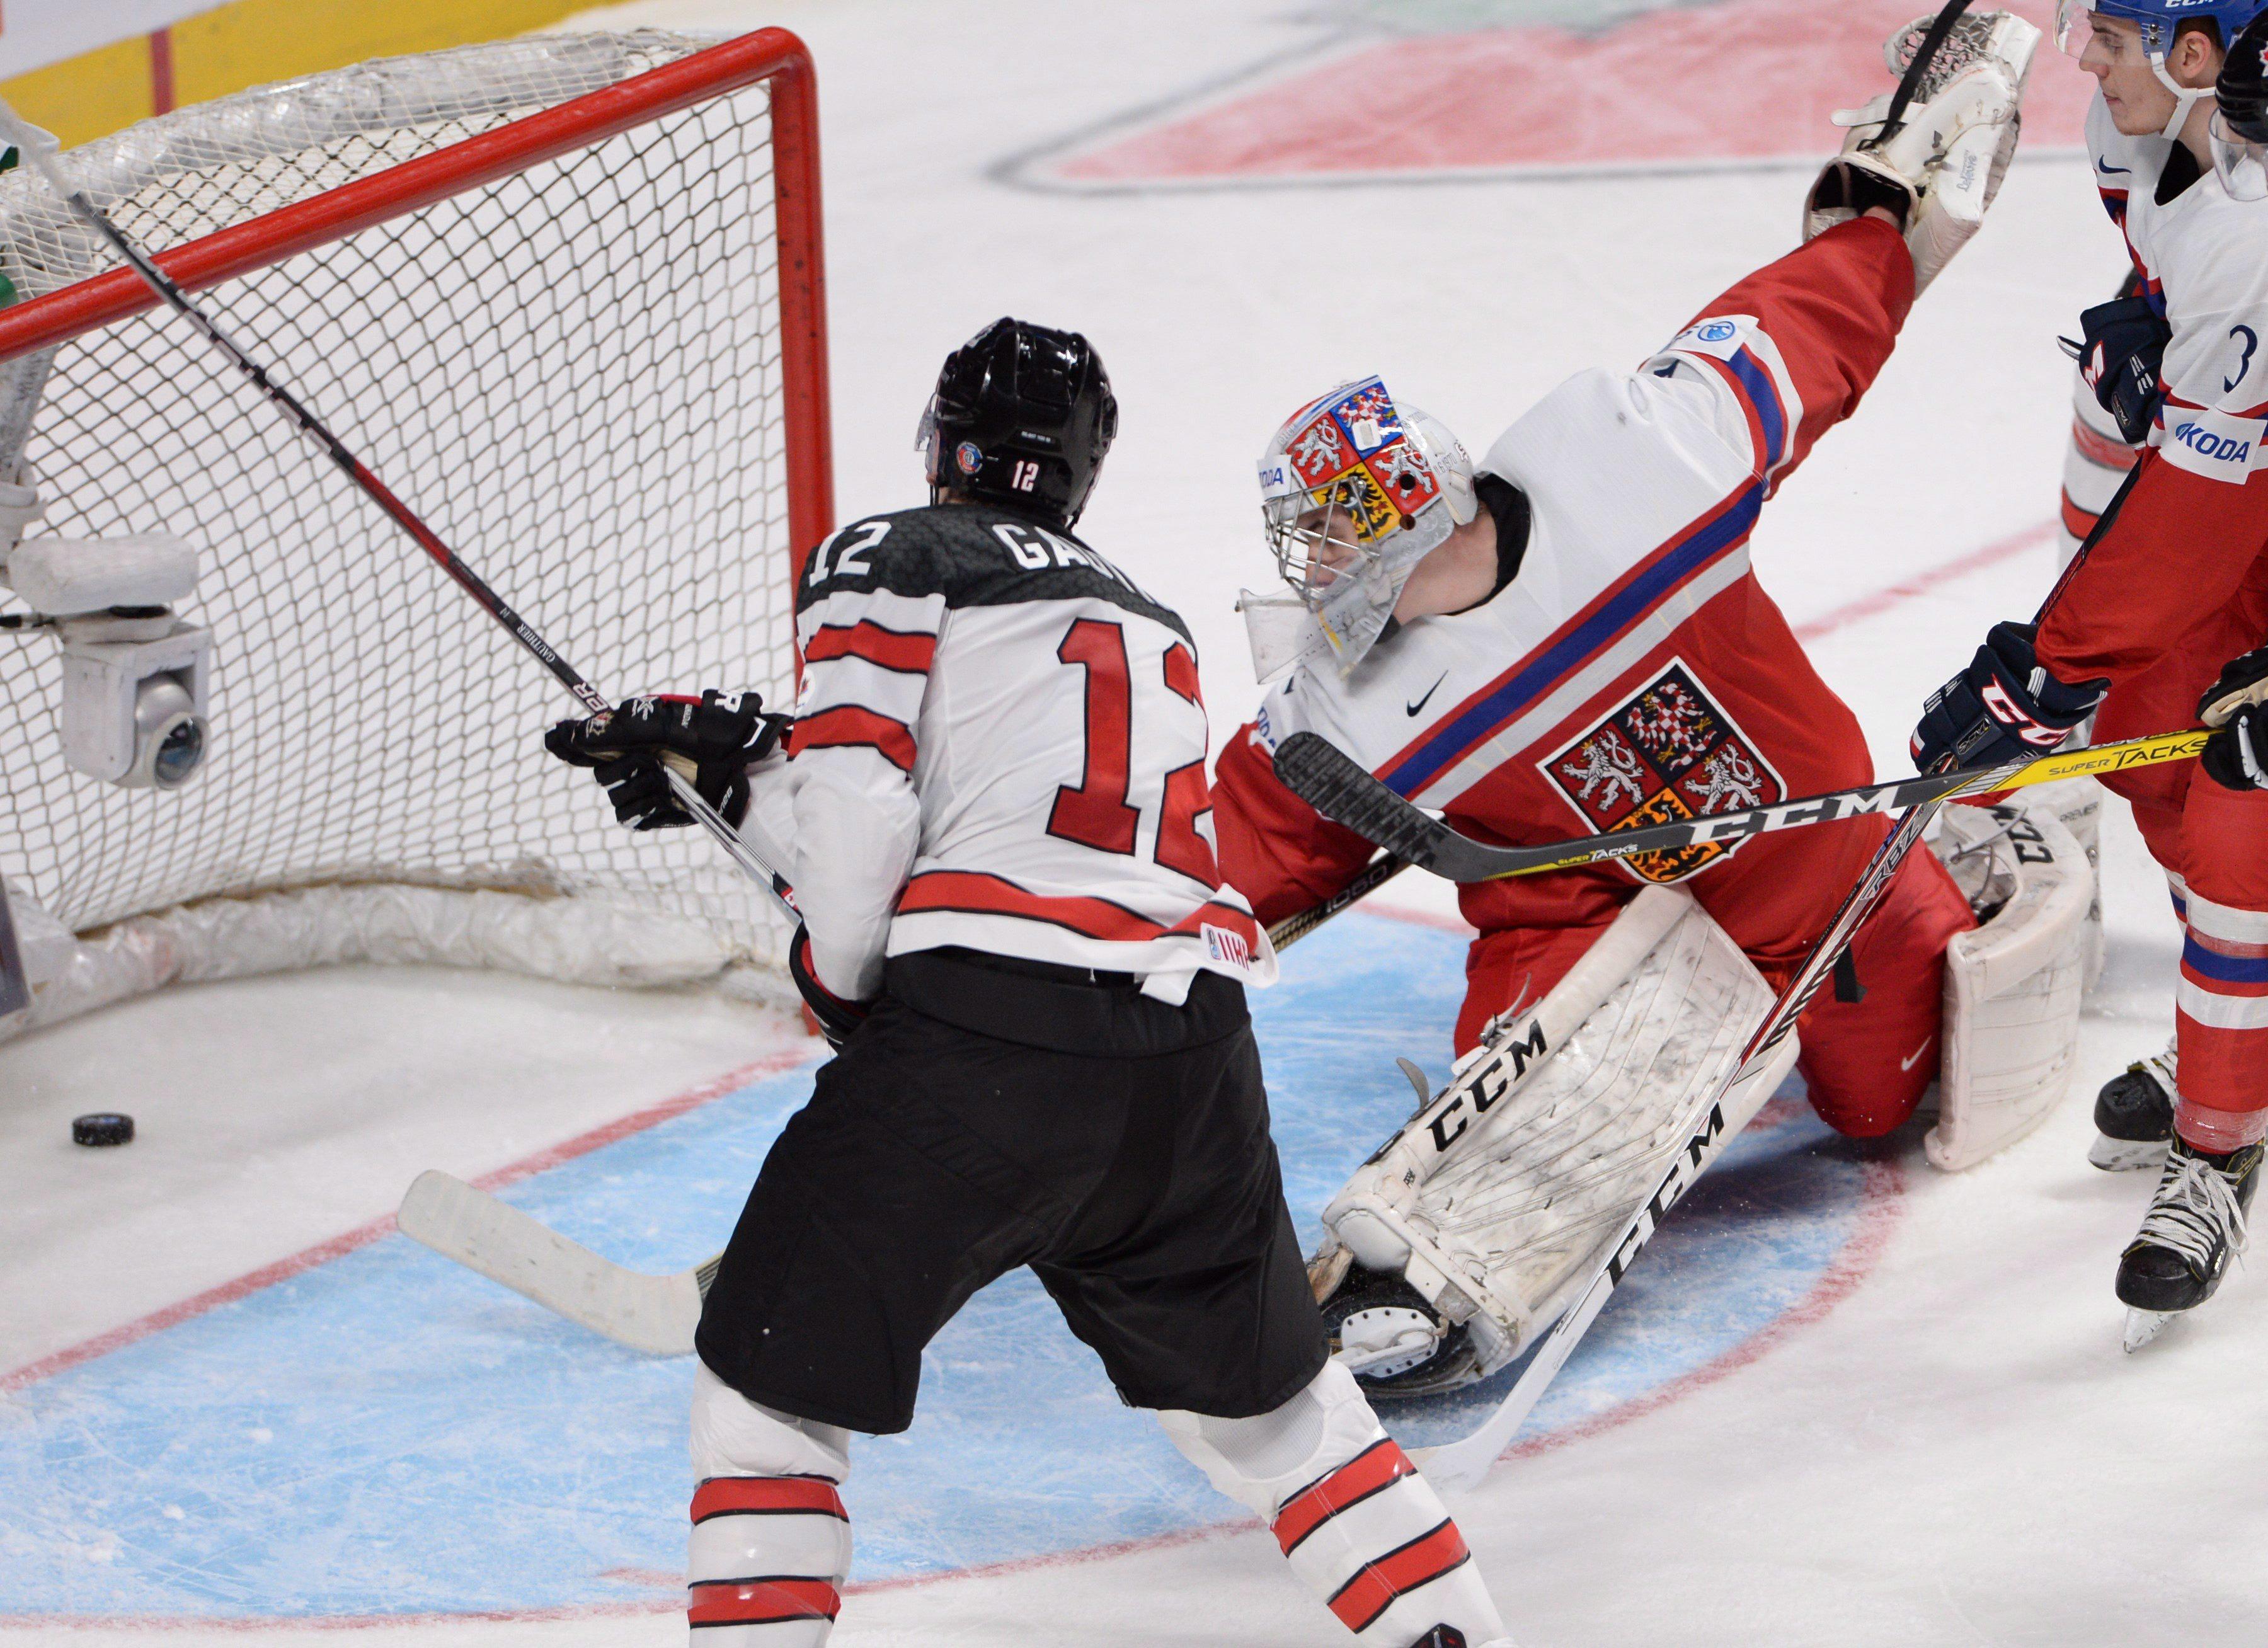 Canada Knocks Off Czechs To Reach World Junior Semifinals